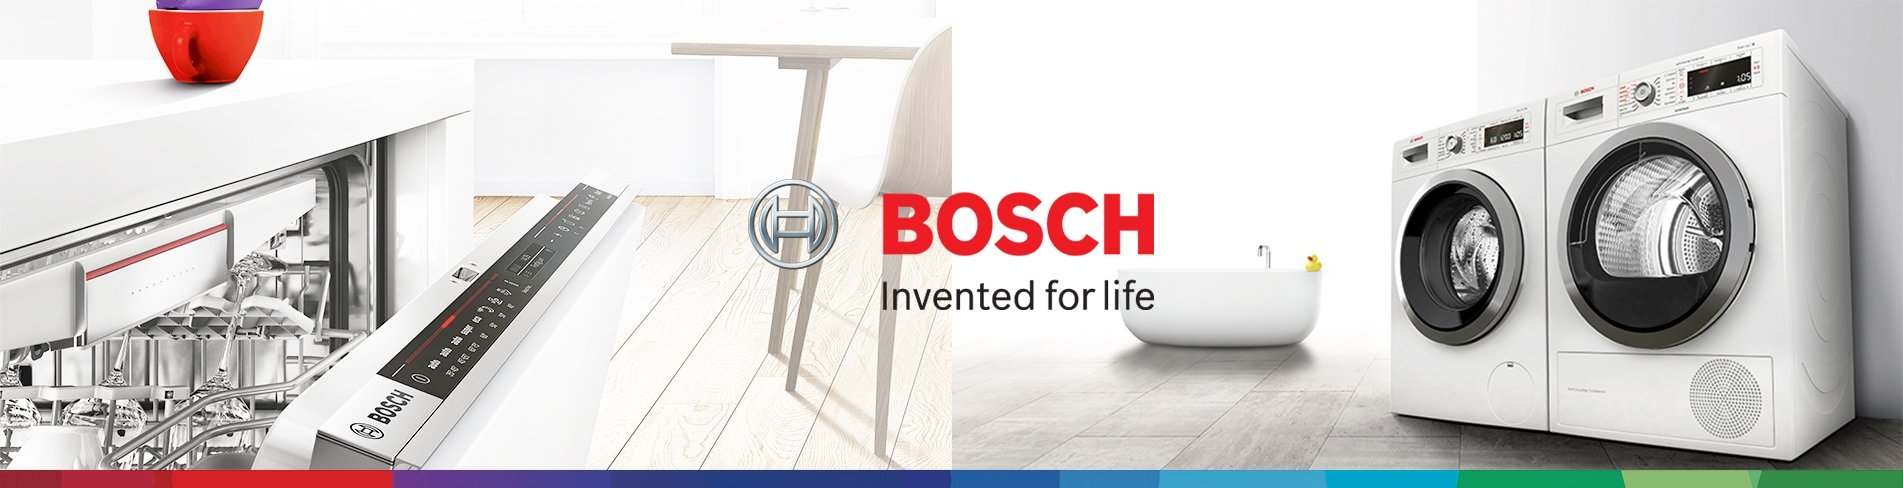 Bosch brand slider